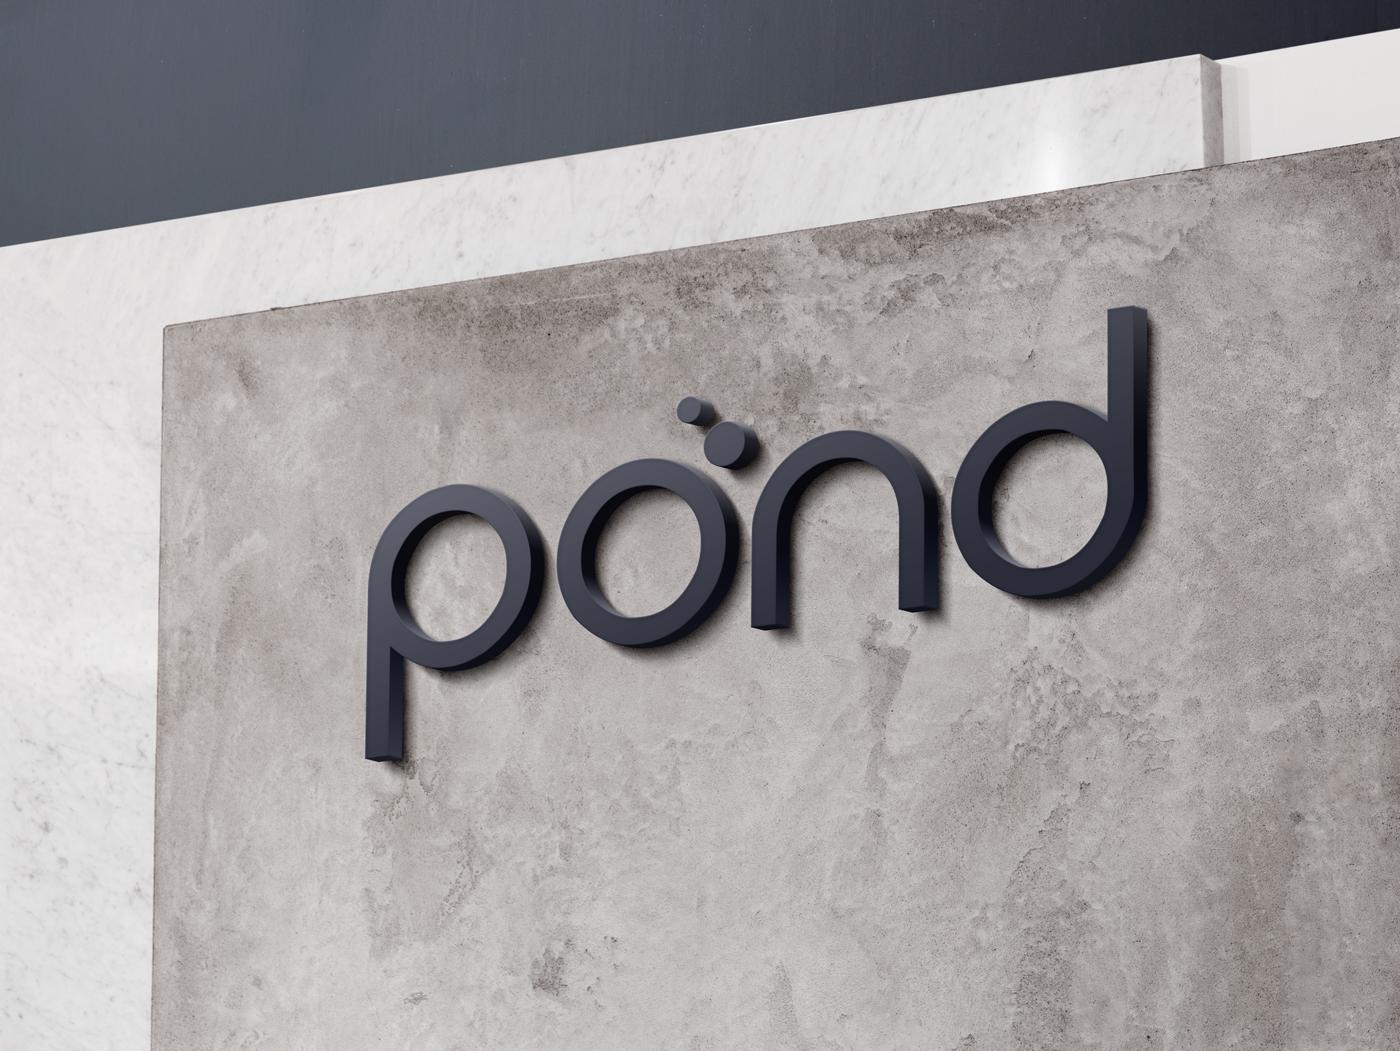 pond biomaterials, maria refsgaard, krims, grafisk design, freelance, selvstændig, aarhus